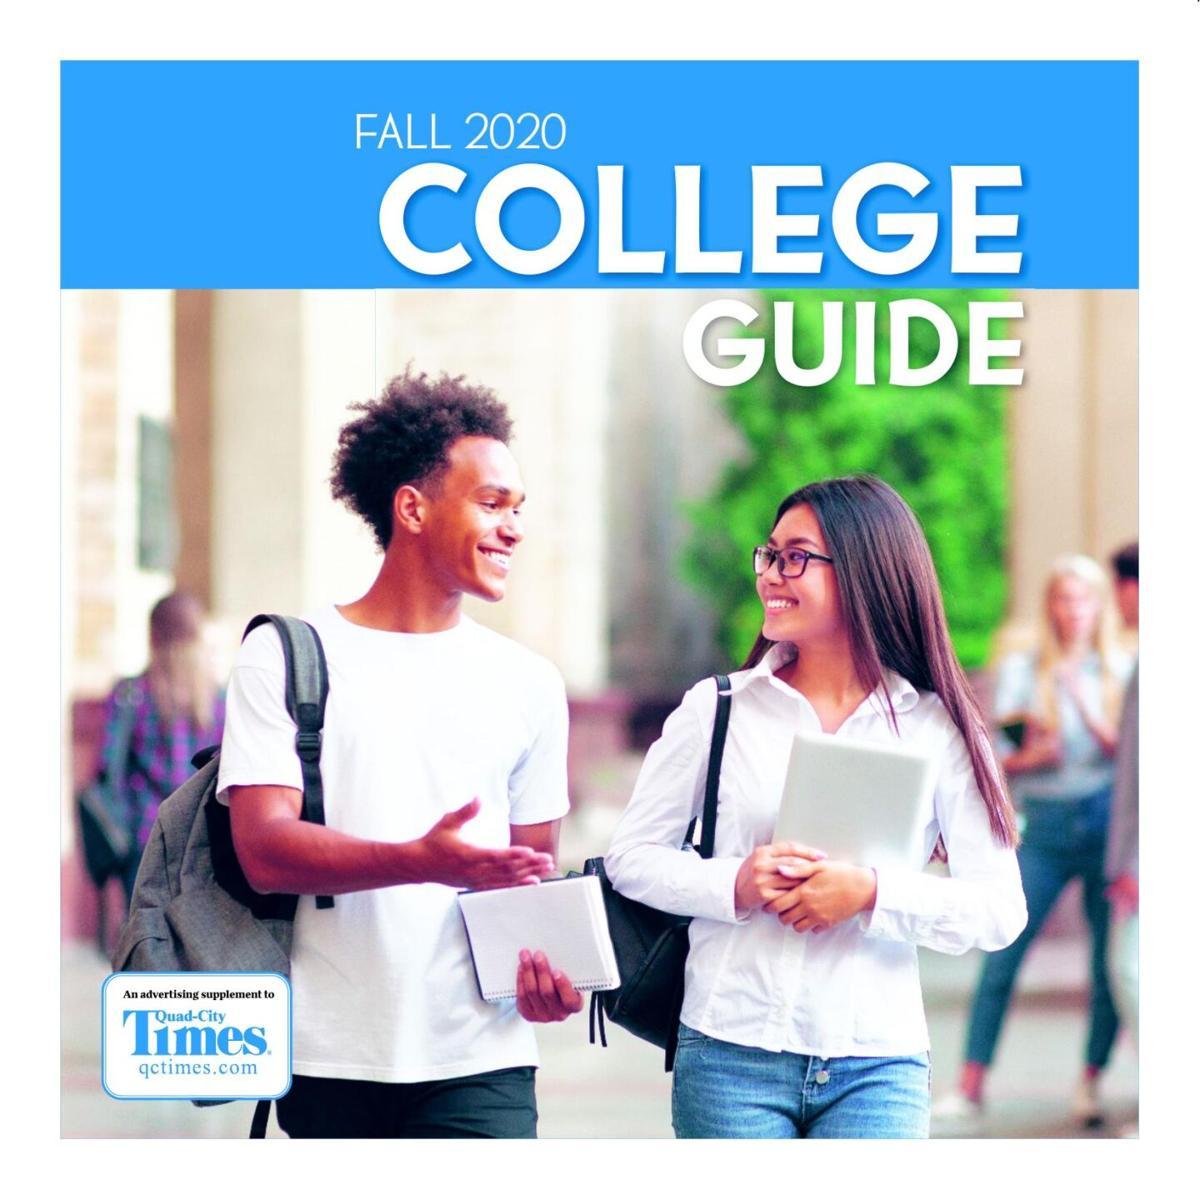 Fall 2020 College Guide